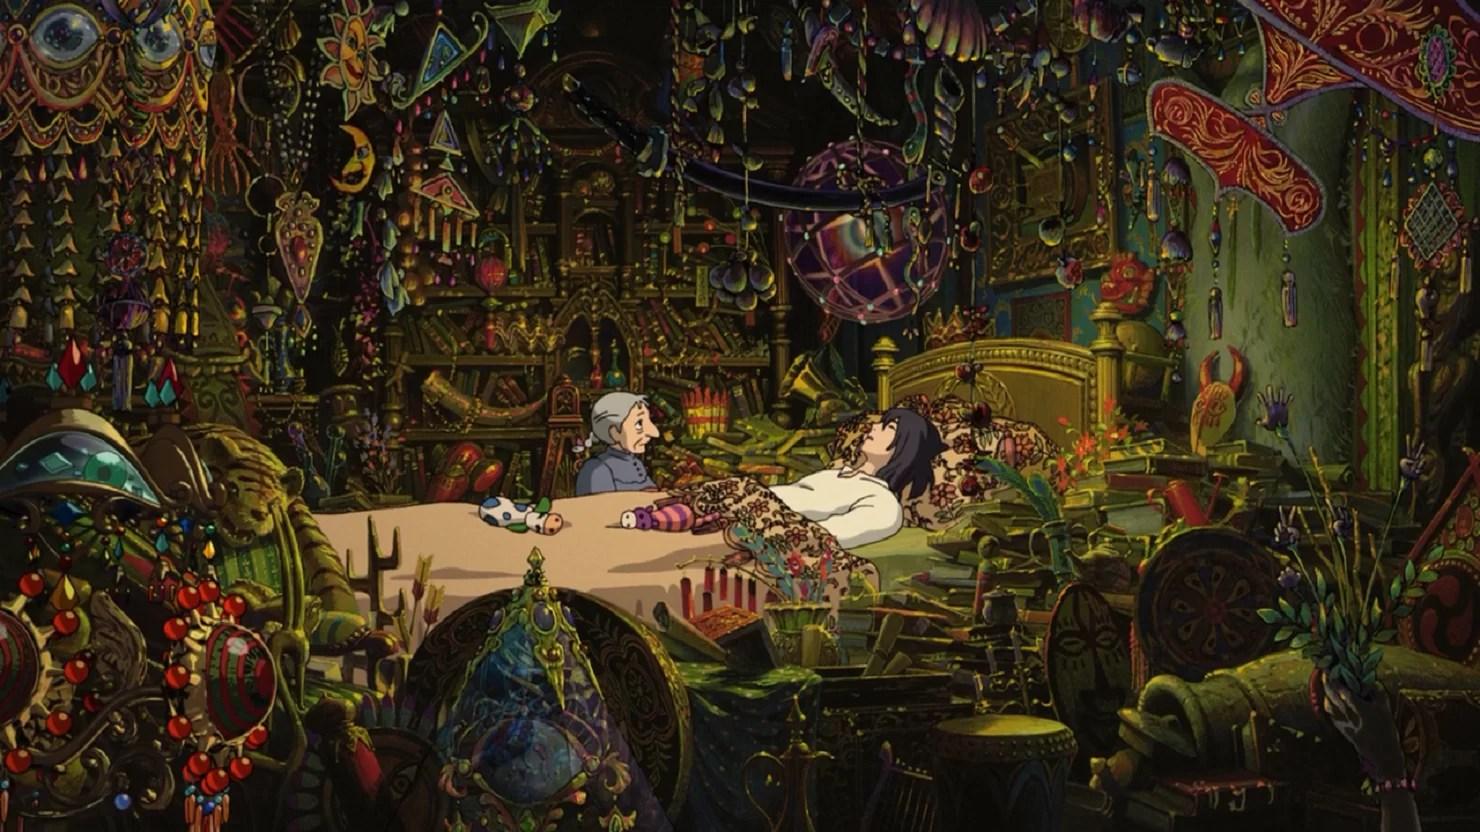 Ghibli Studio